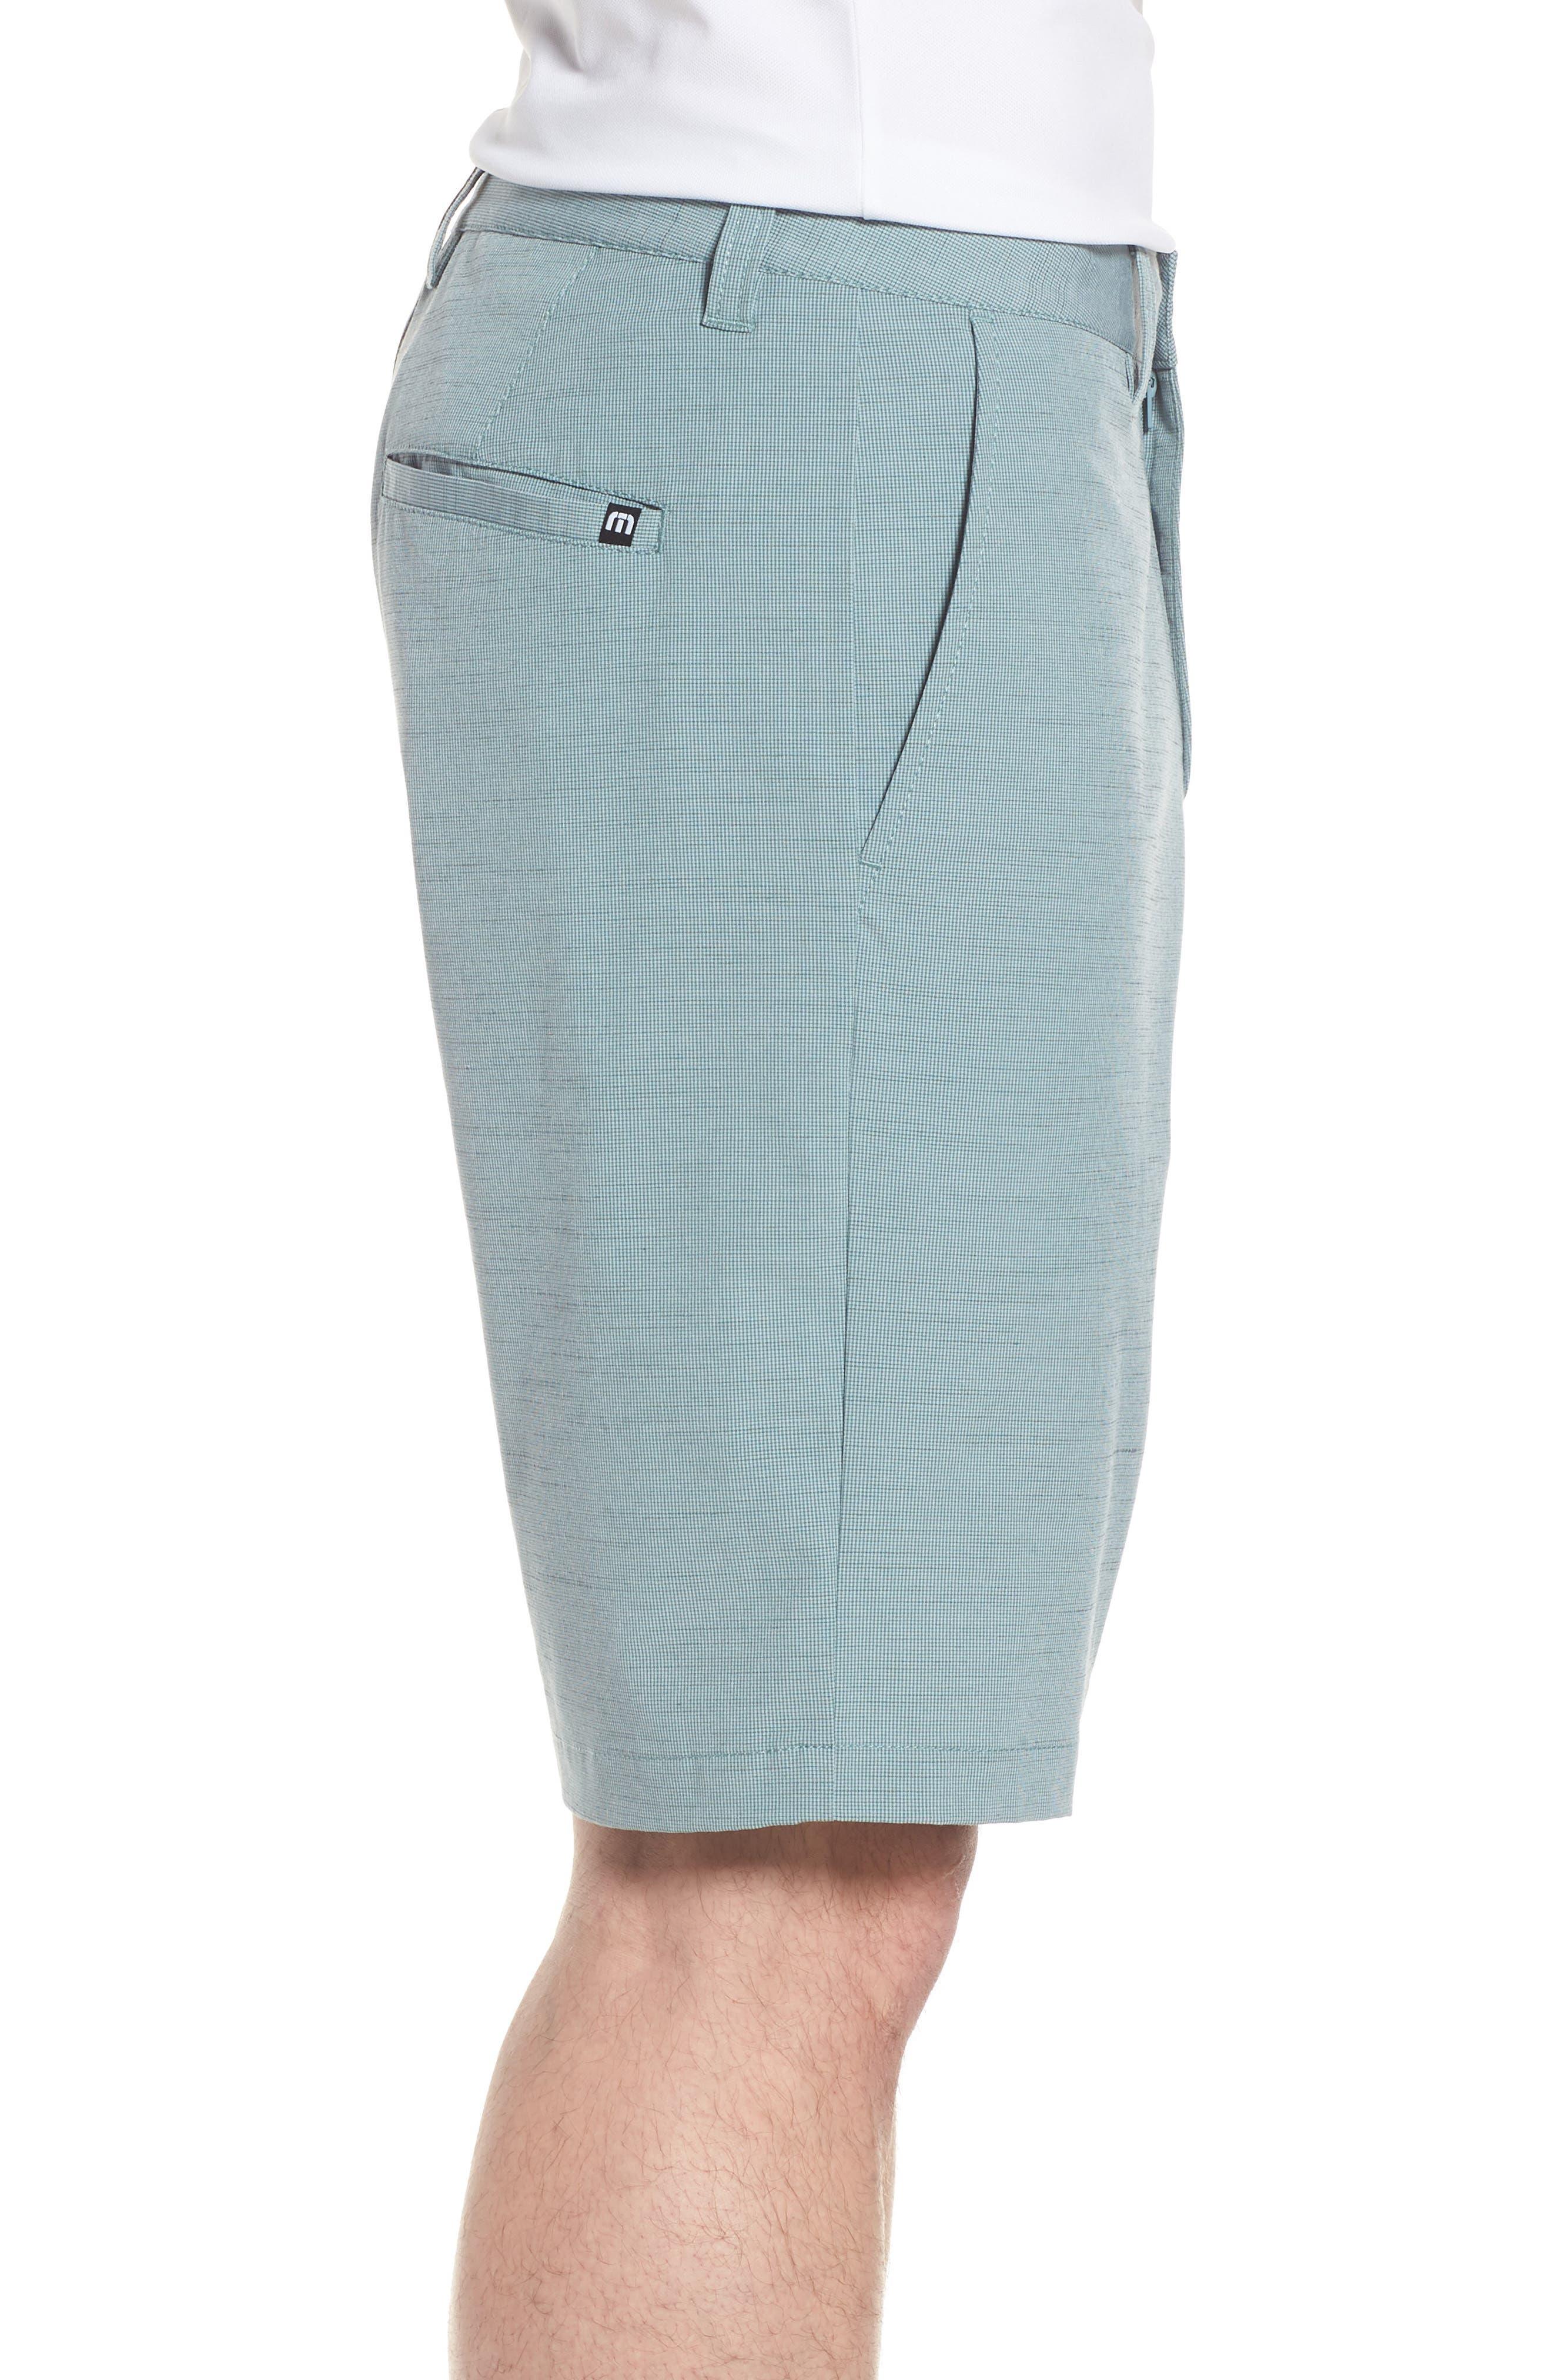 Tulum Stretch Shorts,                             Alternate thumbnail 3, color,                             Canton